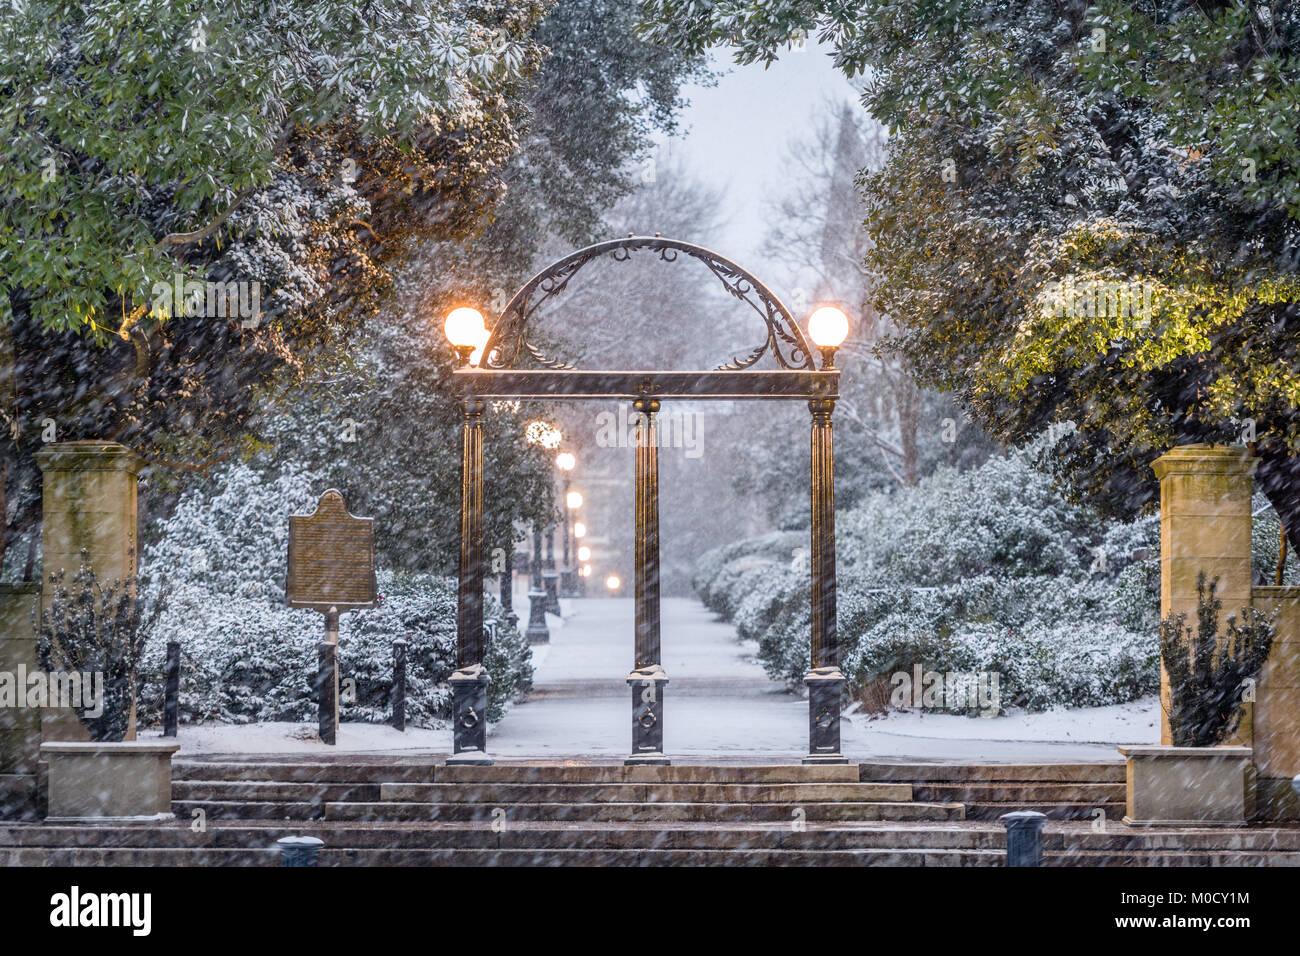 Atene, Georgia, Stati Uniti d'America presso l'Università di Georgia campus arch d'inverno. Immagini Stock